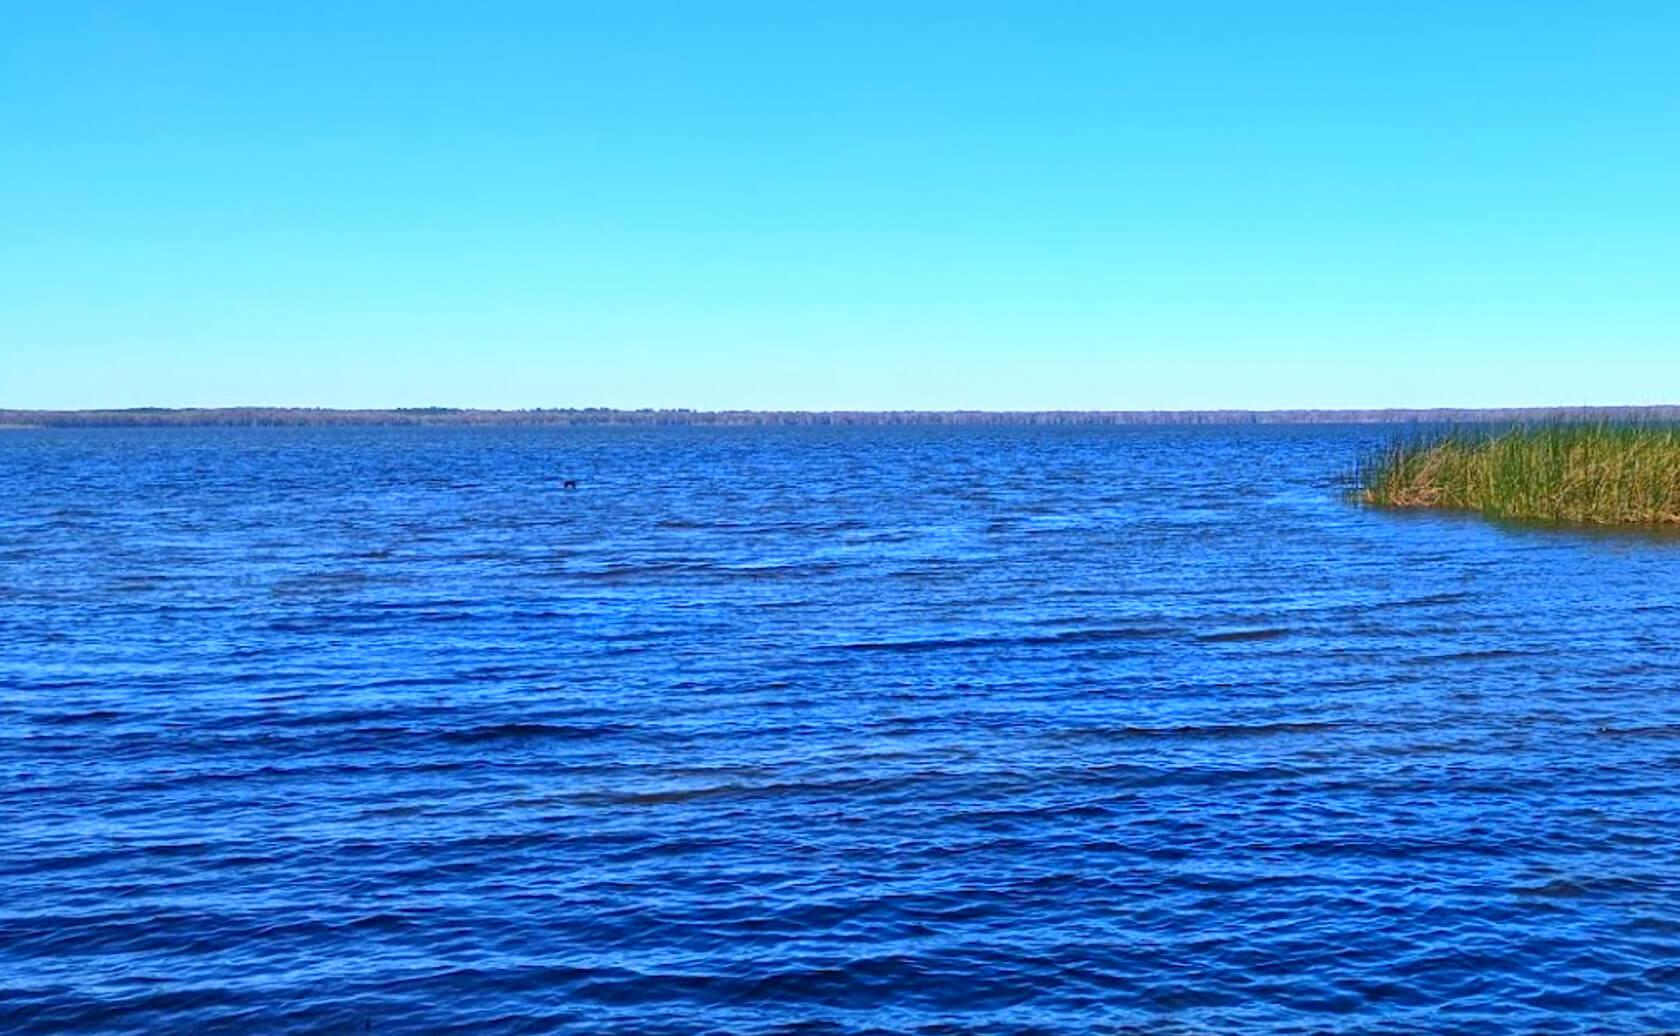 Newnans-Lake-Fishing-Guide-Report-Florida-03